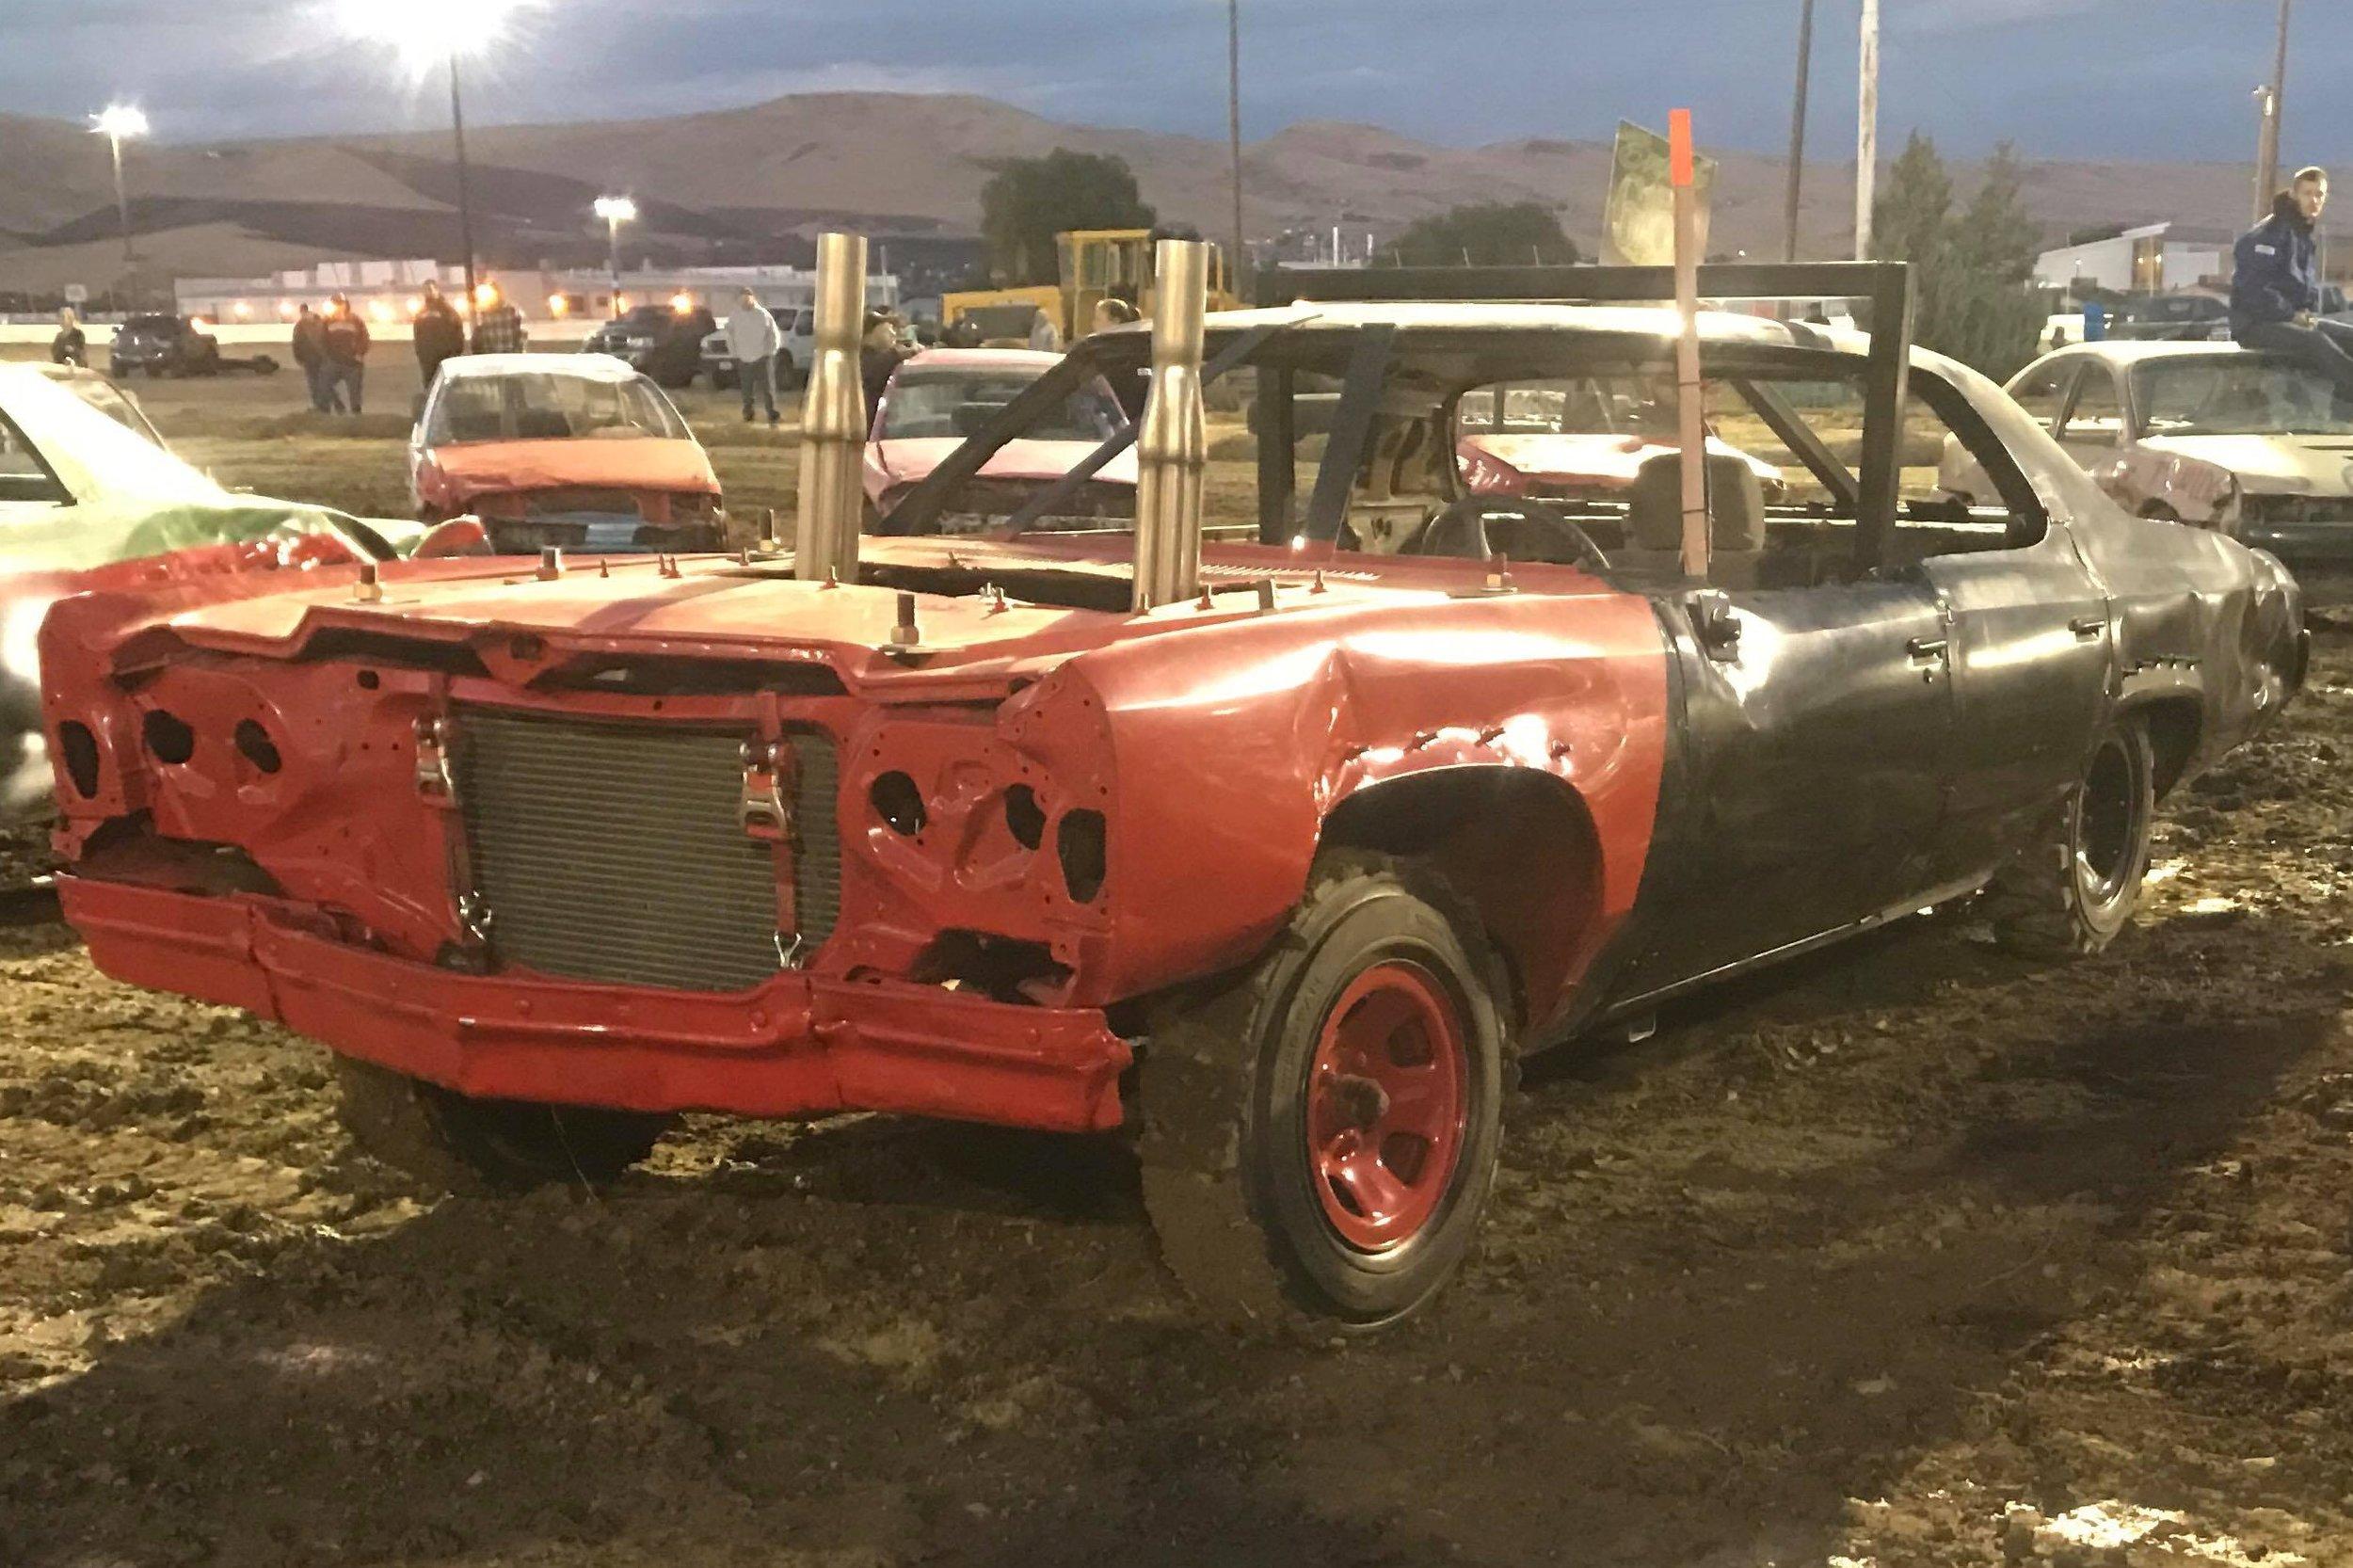 #615 Darryl Ortuno - Hometown: Omak, WAAge: 24Experience: 8 yearsSponsors: Ortuno Boys Salvage and Omak Machine Shop